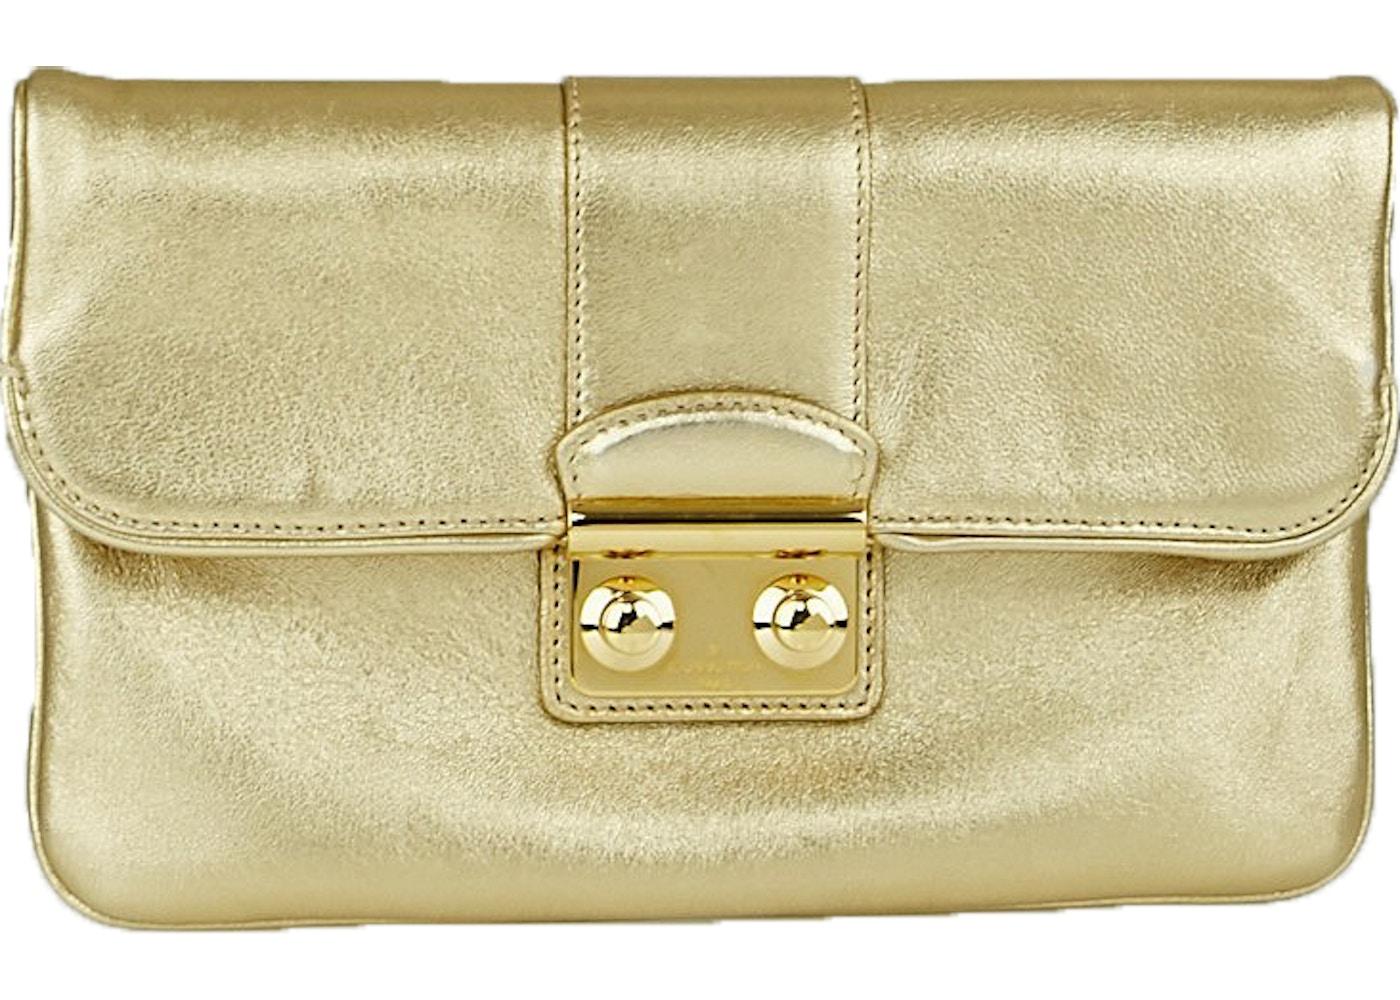 fce2673a764e Sell. or Ask. View All Bids. Louis Vuitton Clutch Sofia Coppola Metallic  Slim Gold